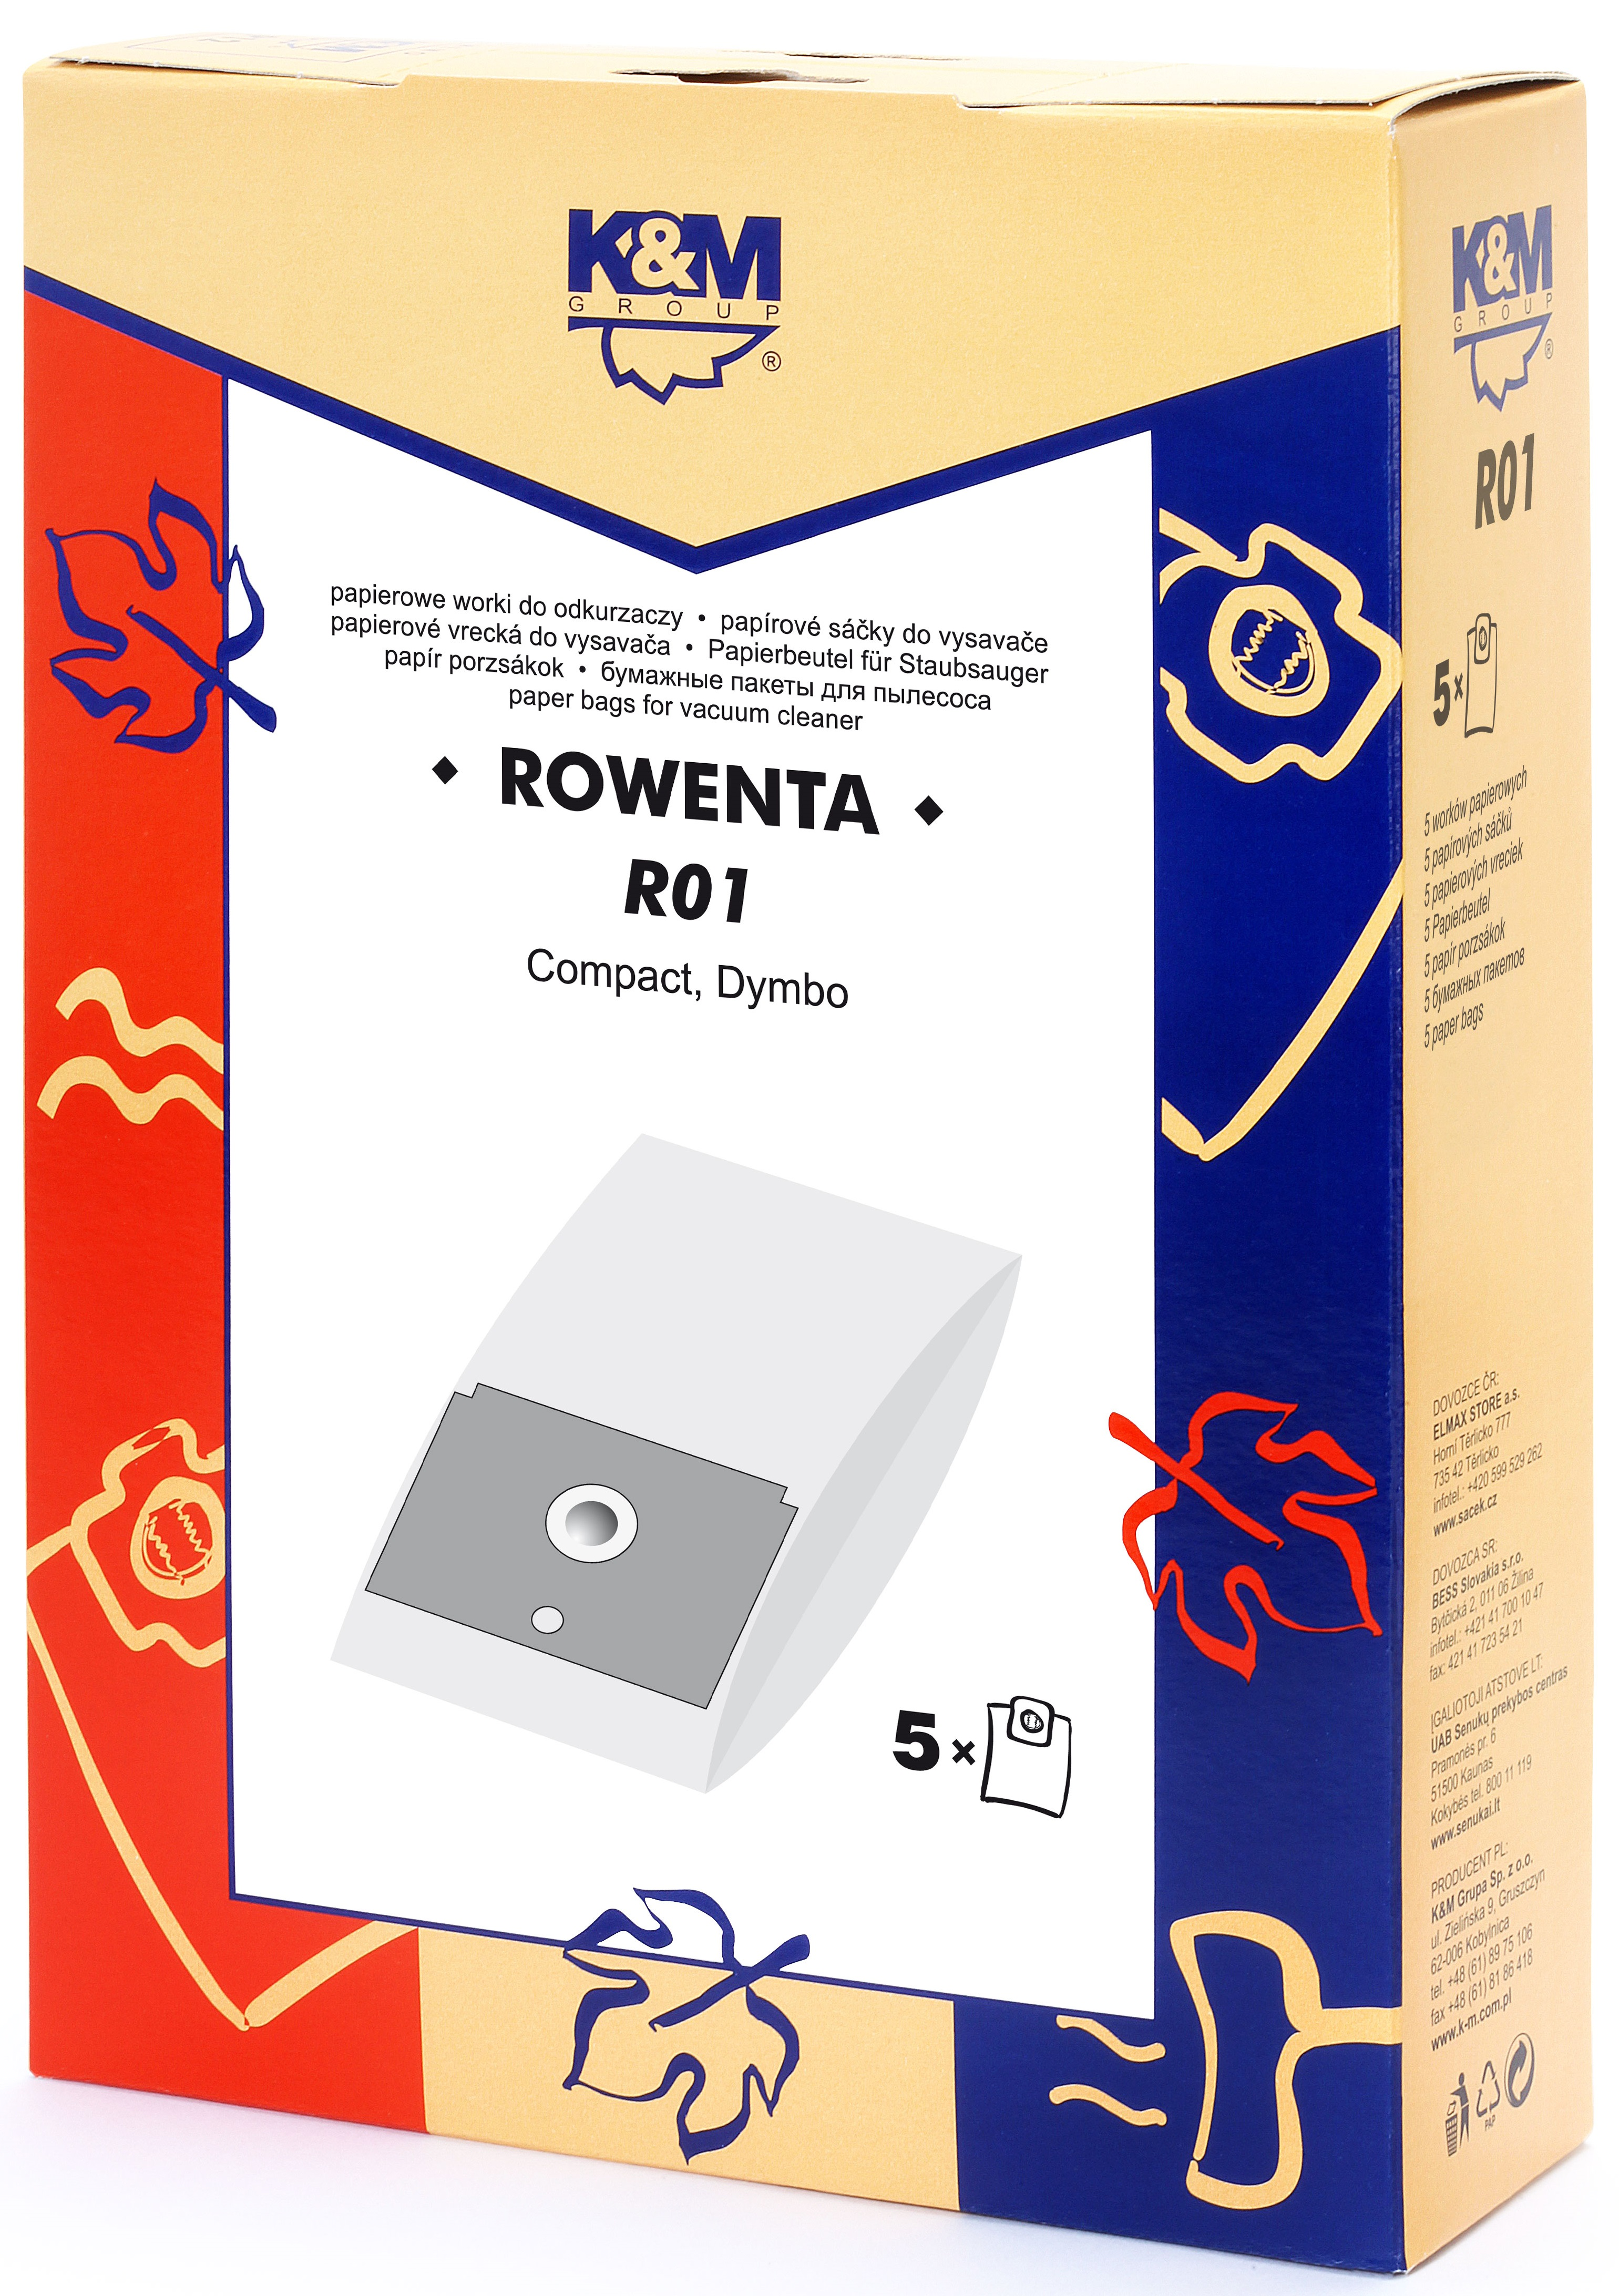 Sac aspirator Rowenta ZR745, hartie, 5X saci, K&M 0